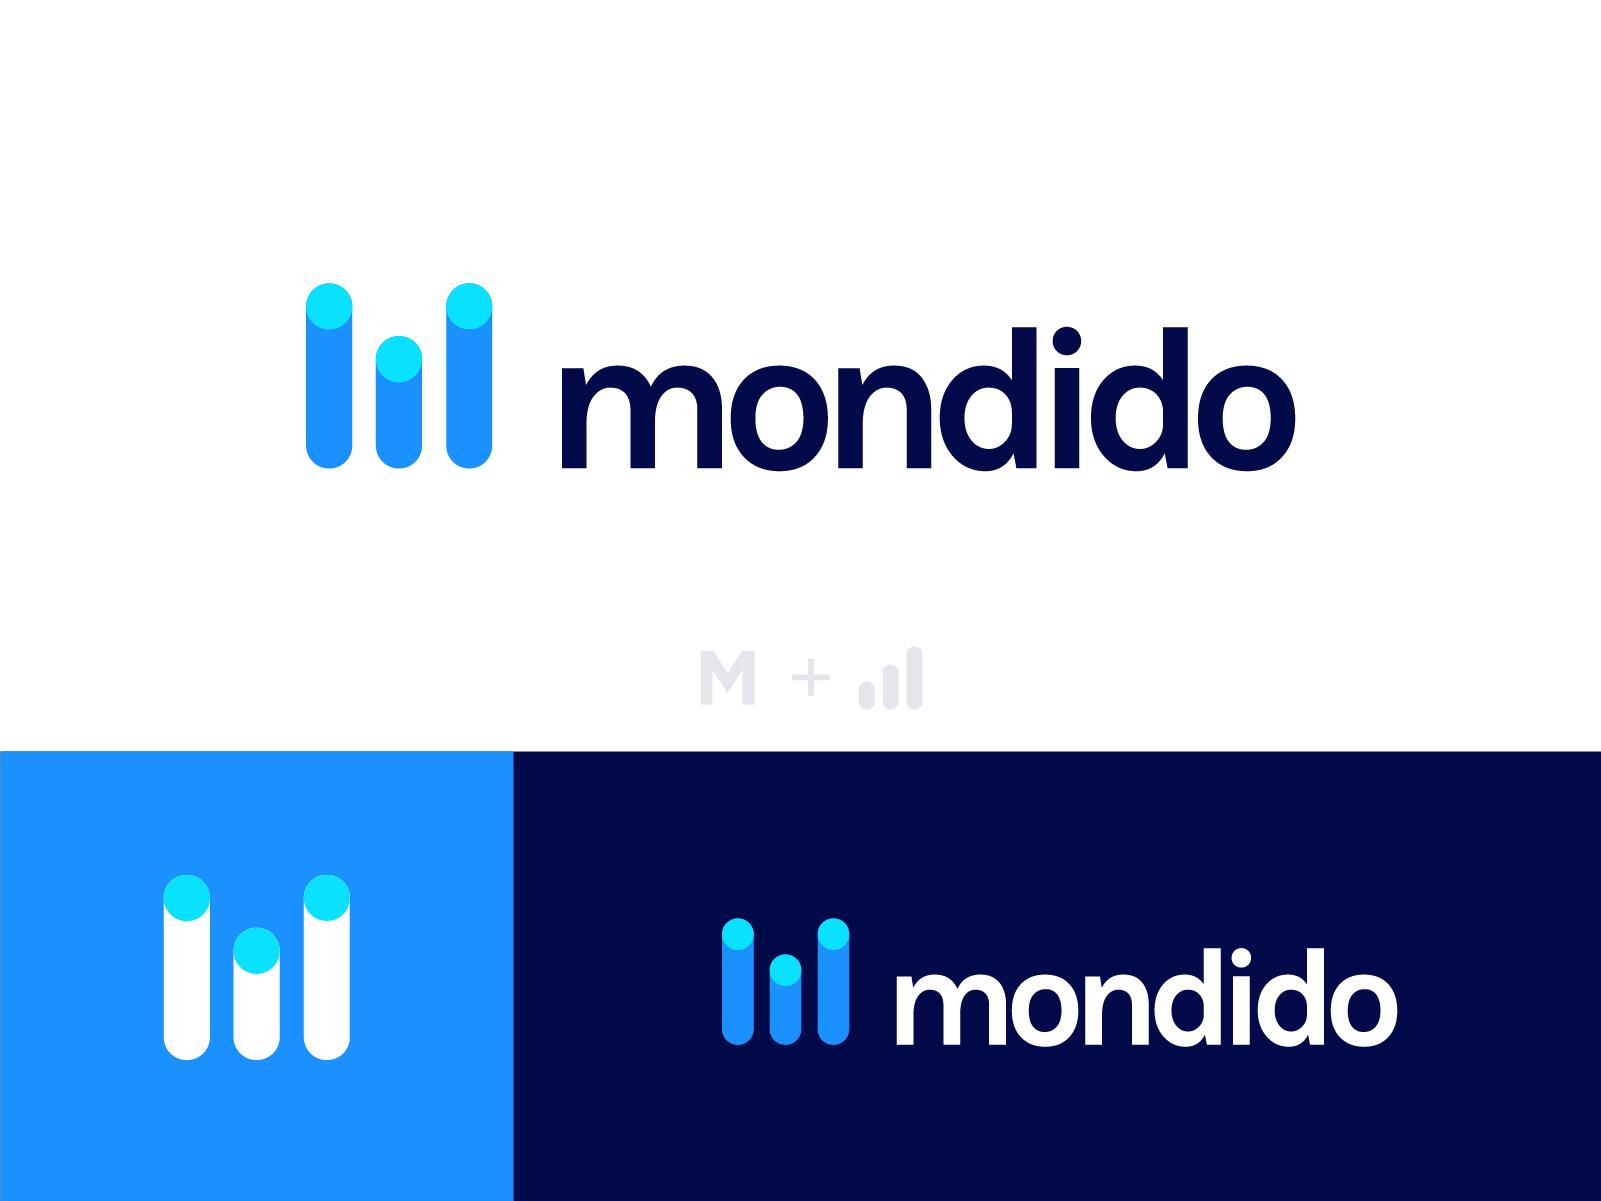 Mondido2 03 08